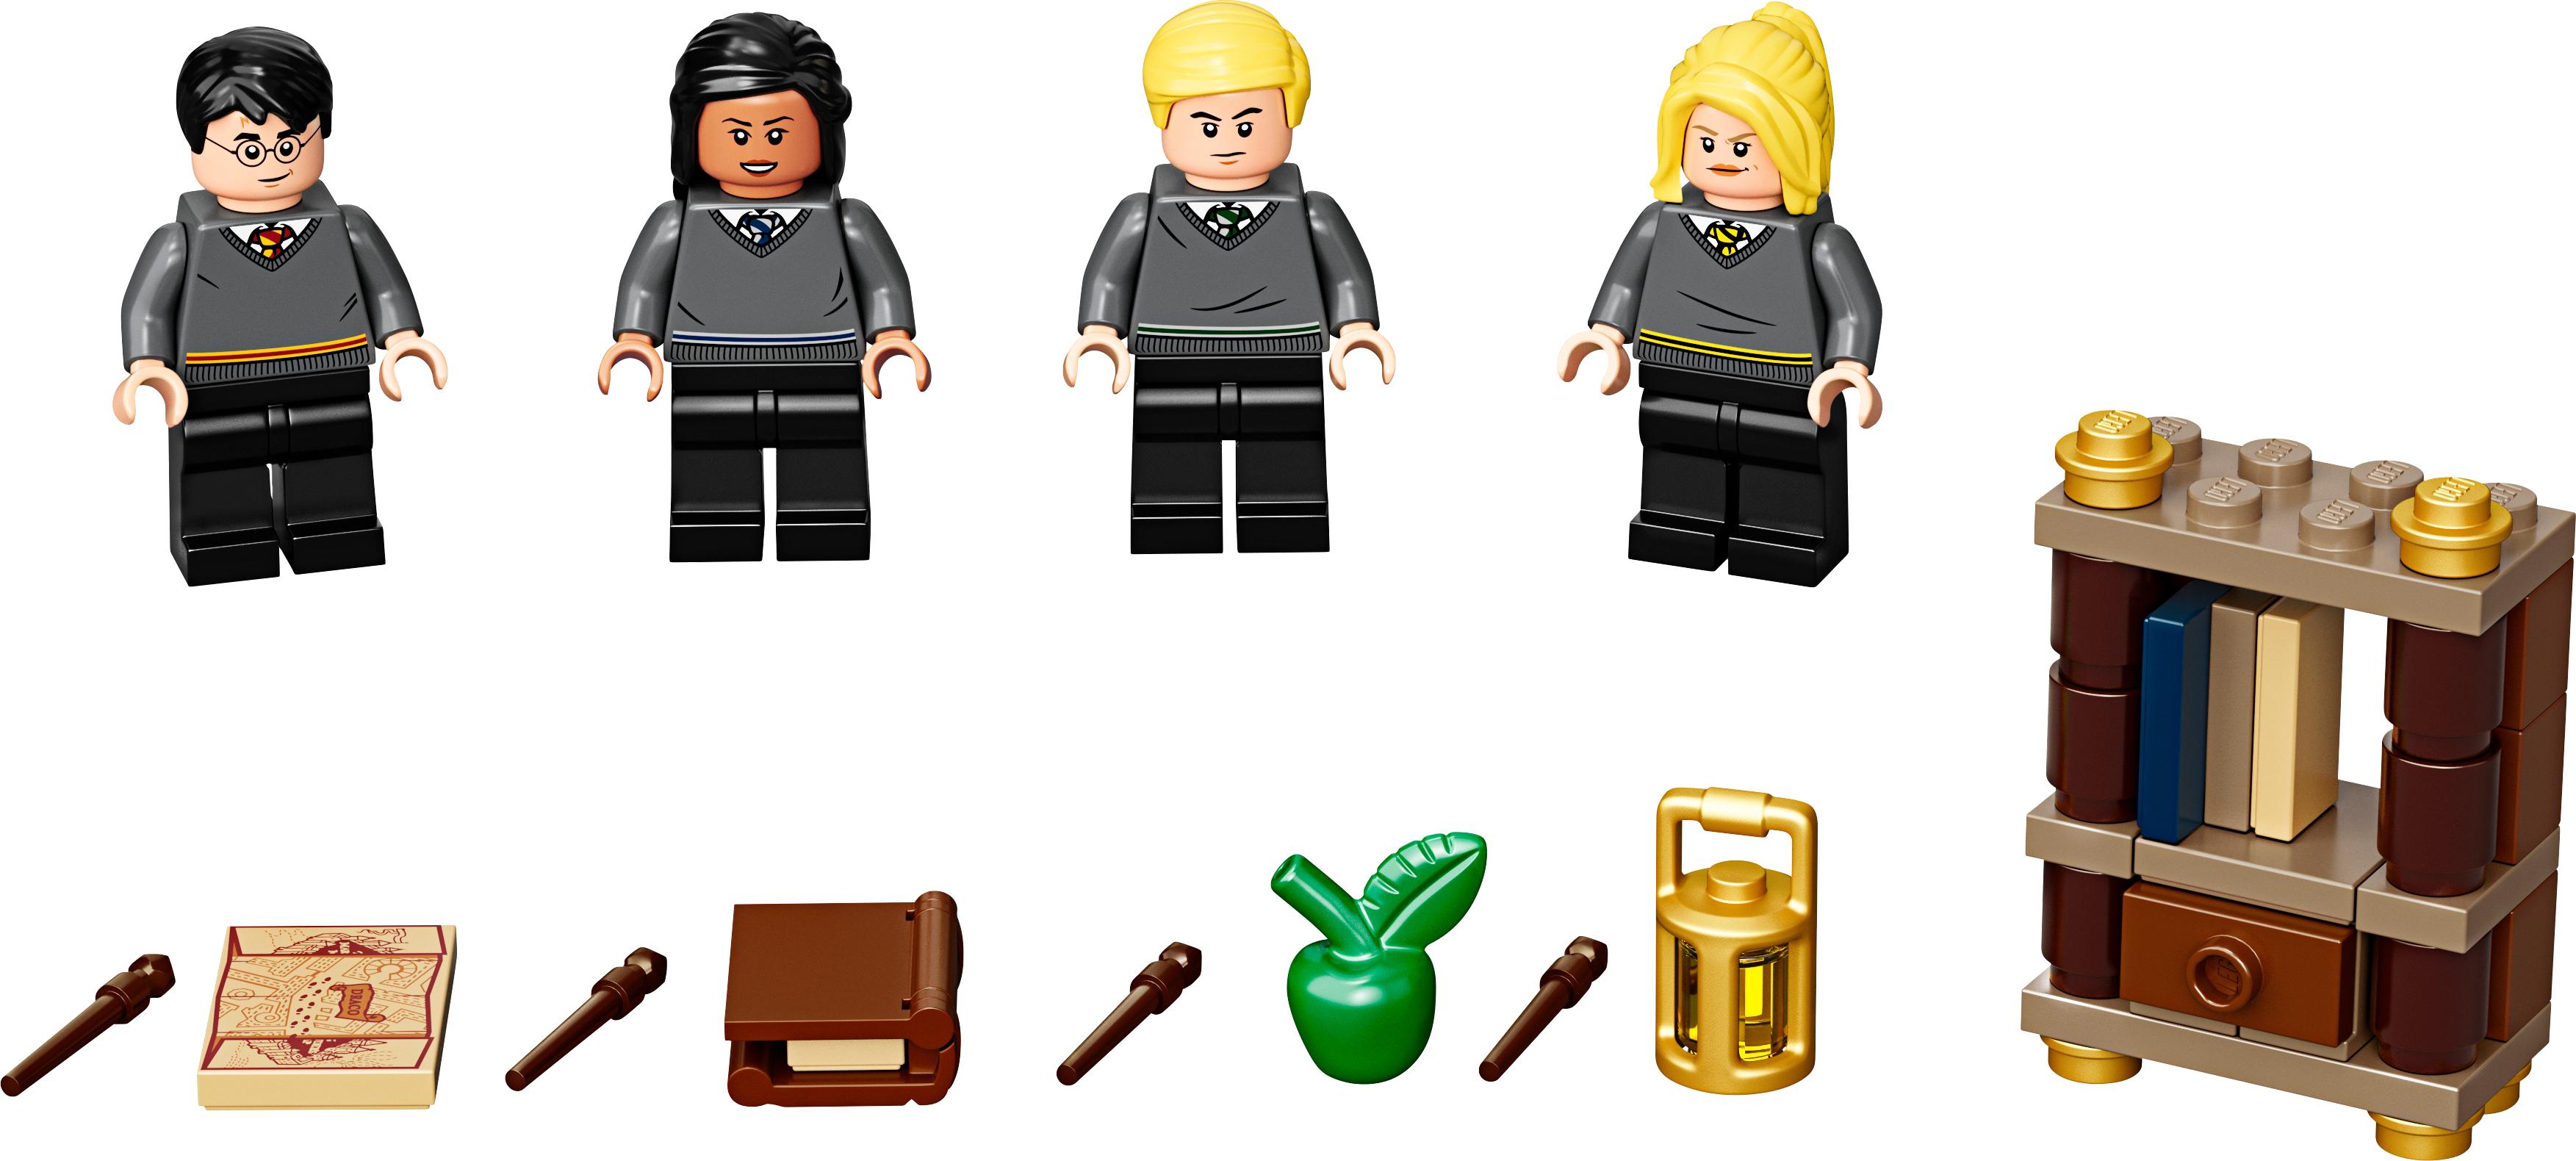 Hogwarts Student Accessory Set